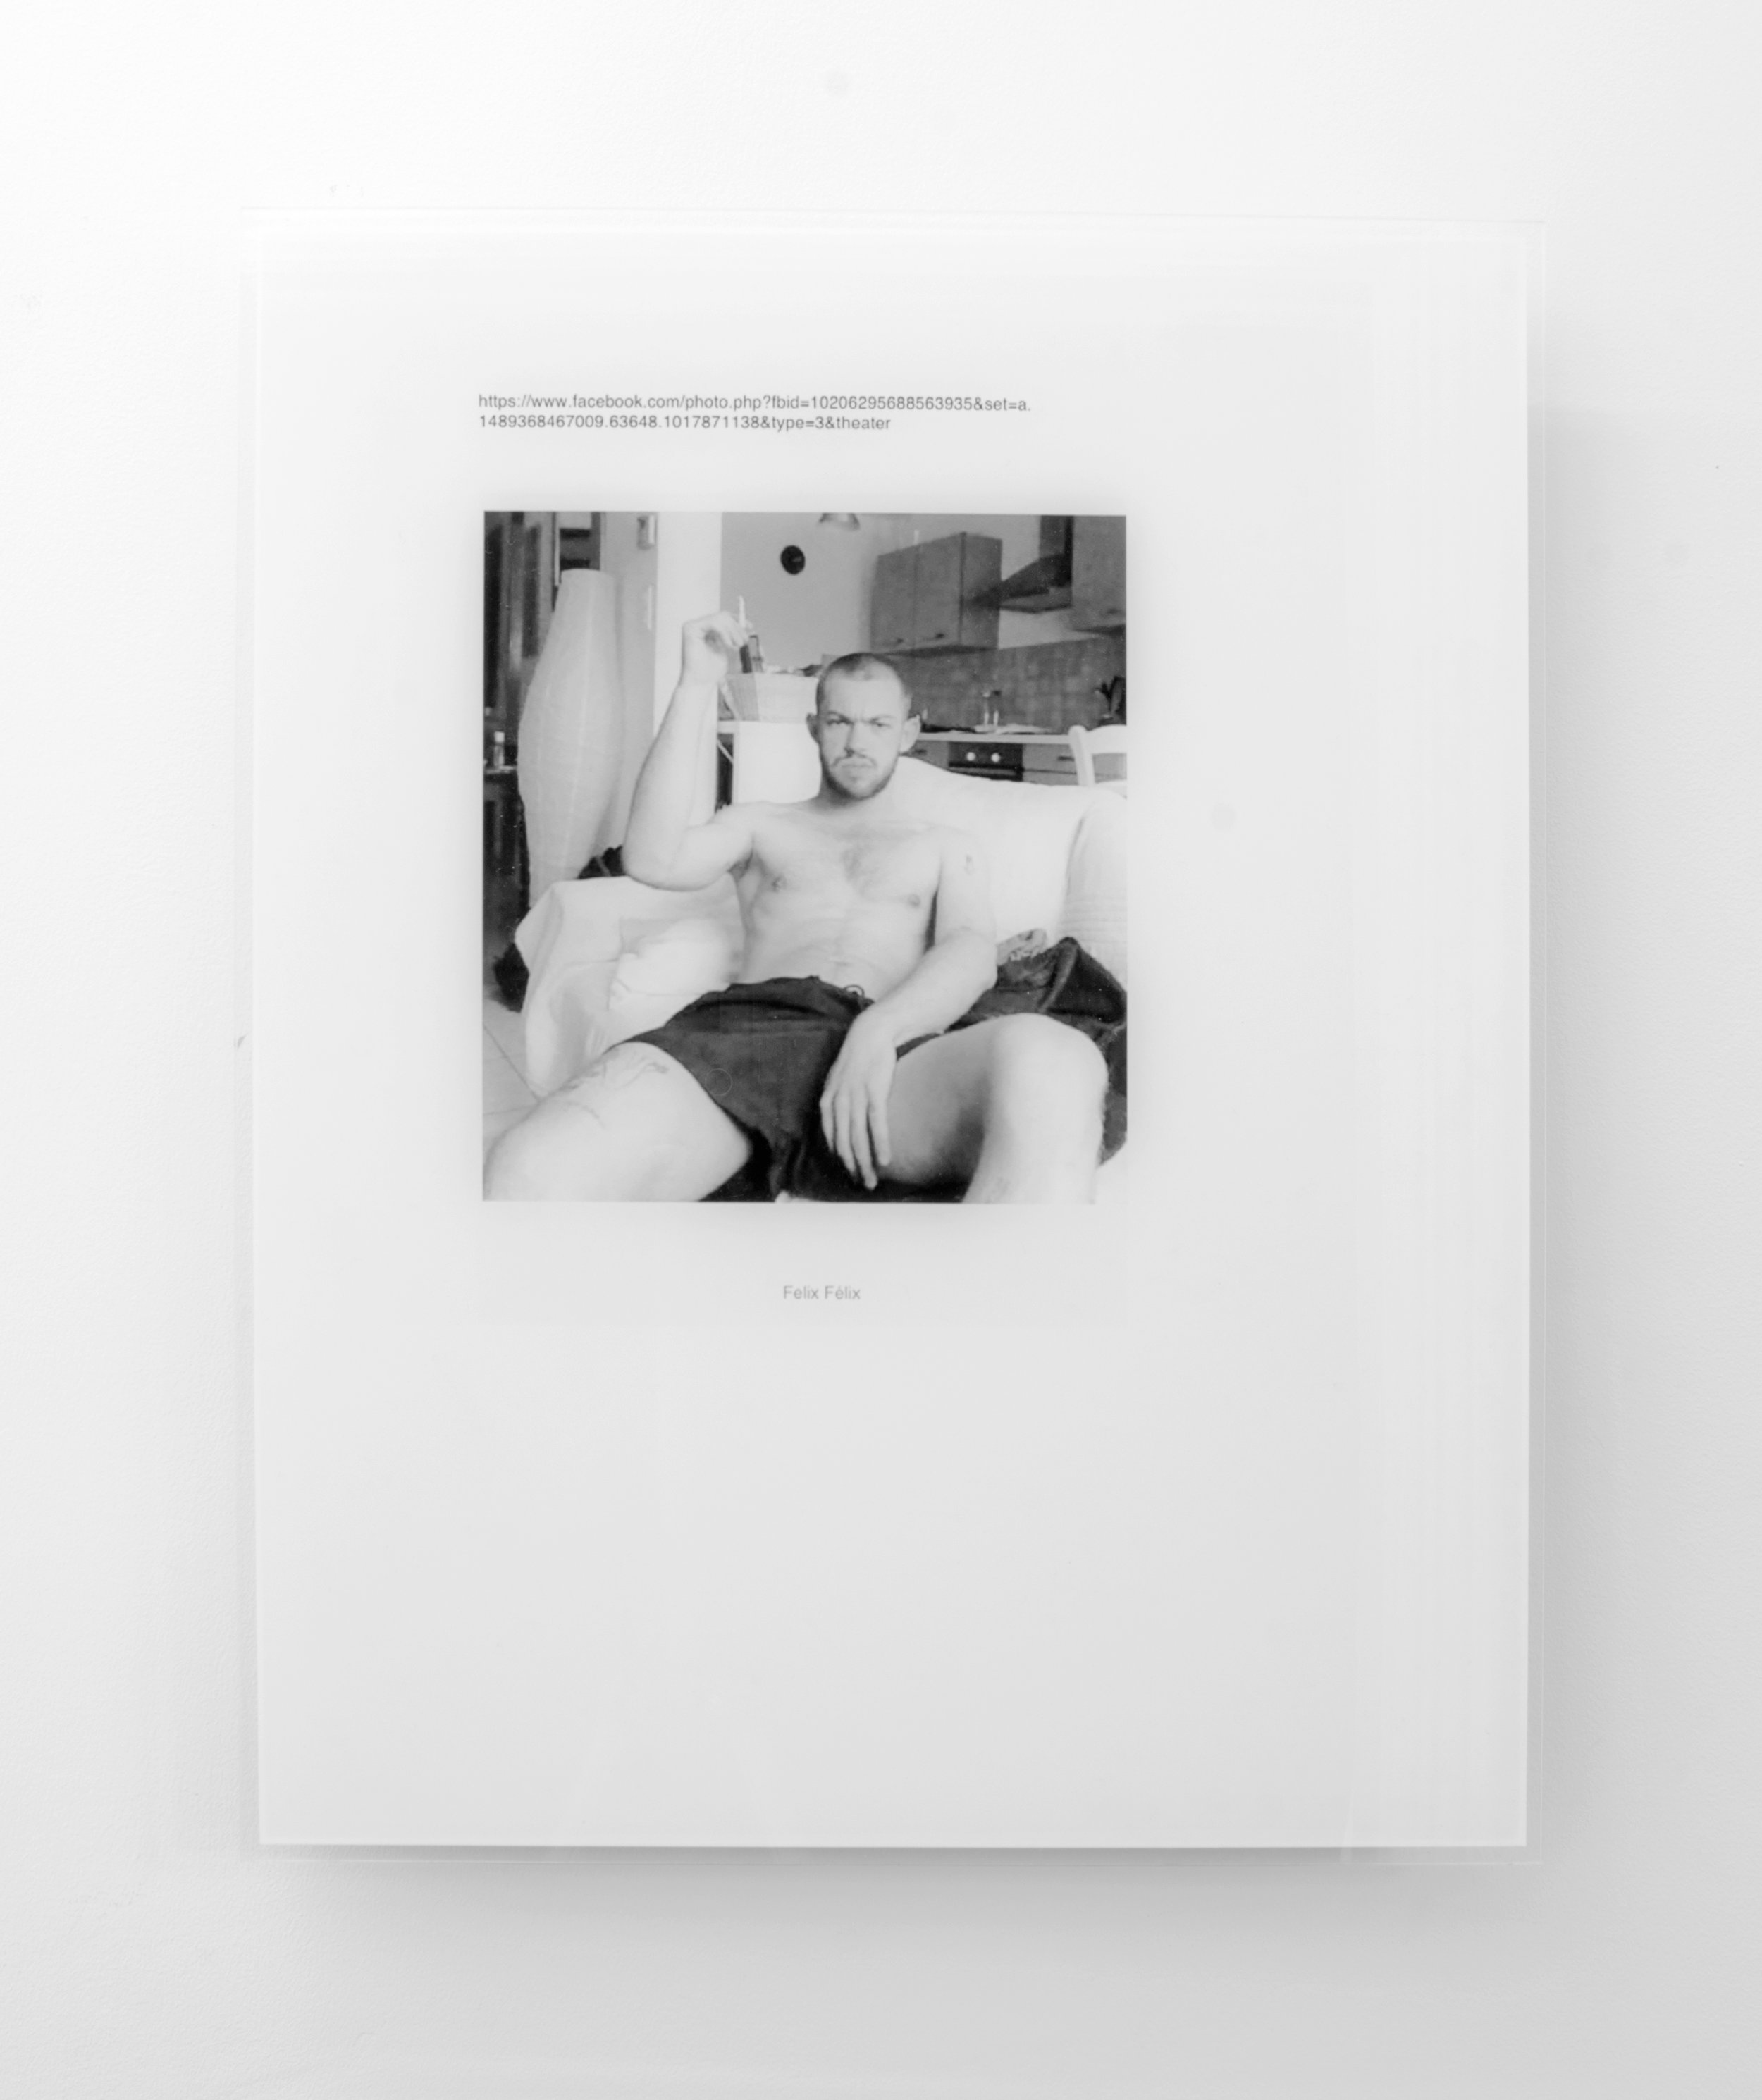 Christophe de Rohan Chabot  Untitled (Felix Felix) , 2018 Acrylic reverse mounted digital print with aluminium substrate and subframe. 50 x 40 x 2.6 cm